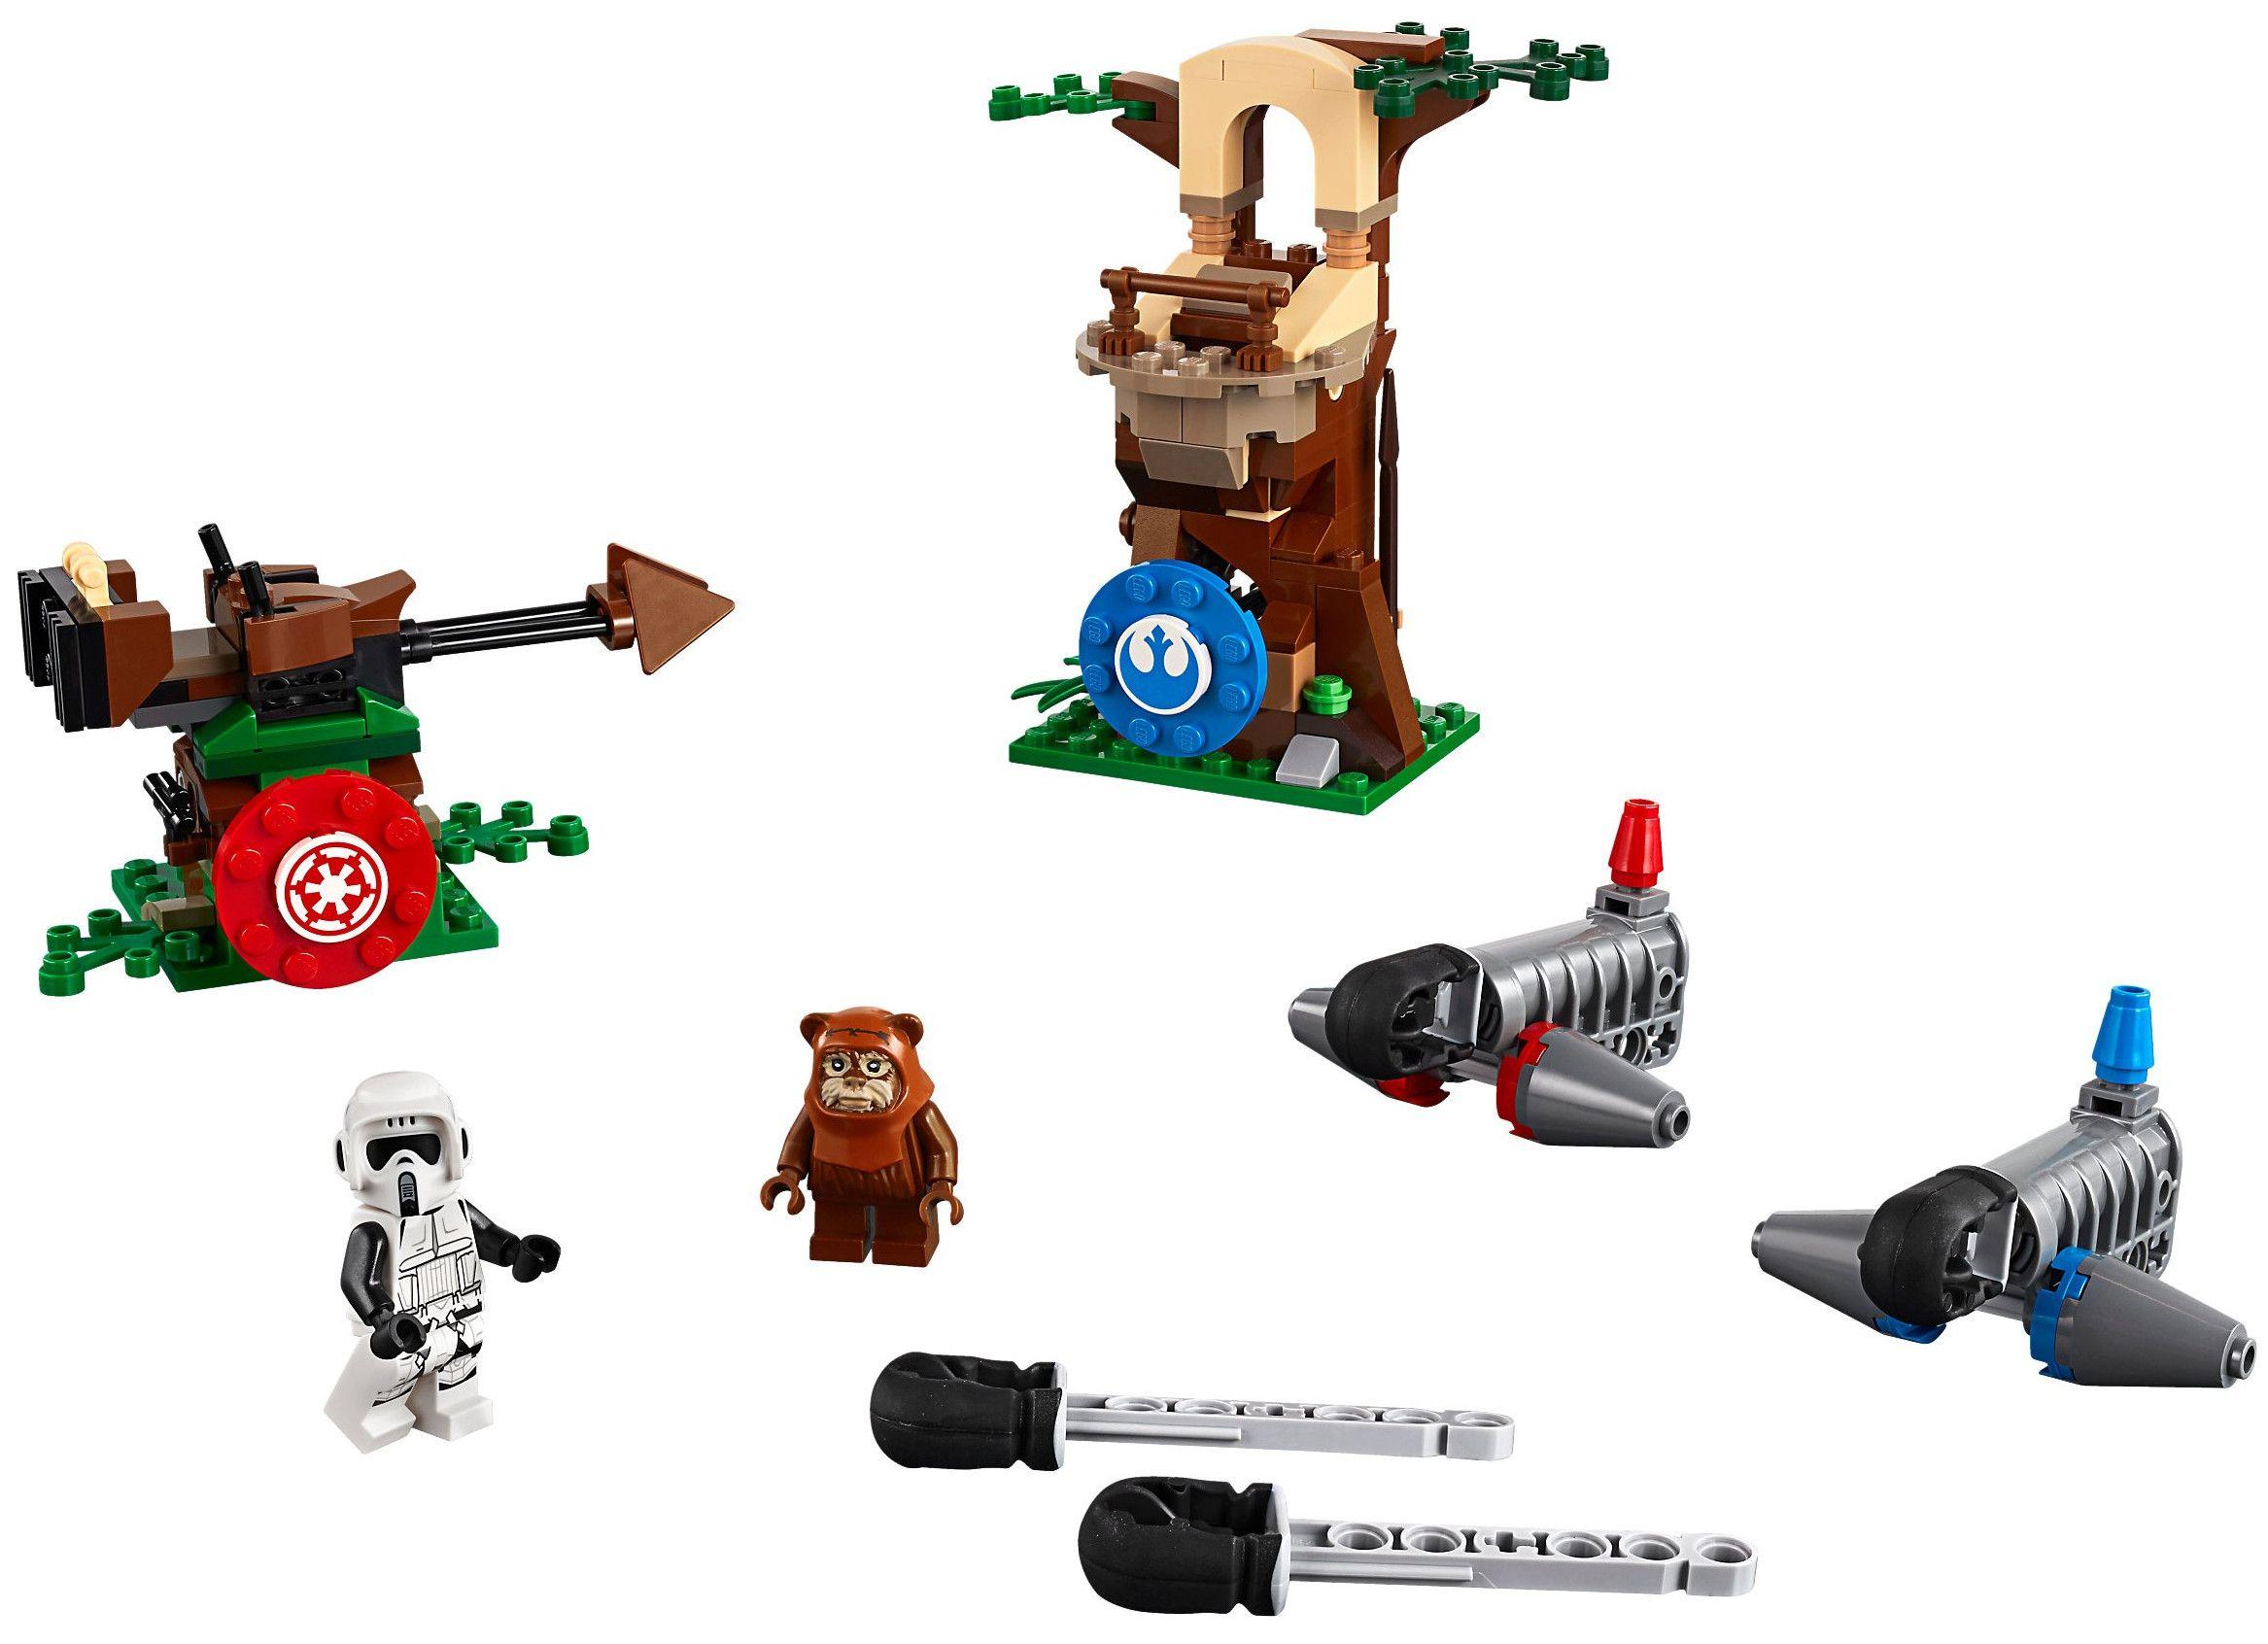 Конструктор Lego Star Wars - Action Battle Endor Assault (75238) - 3